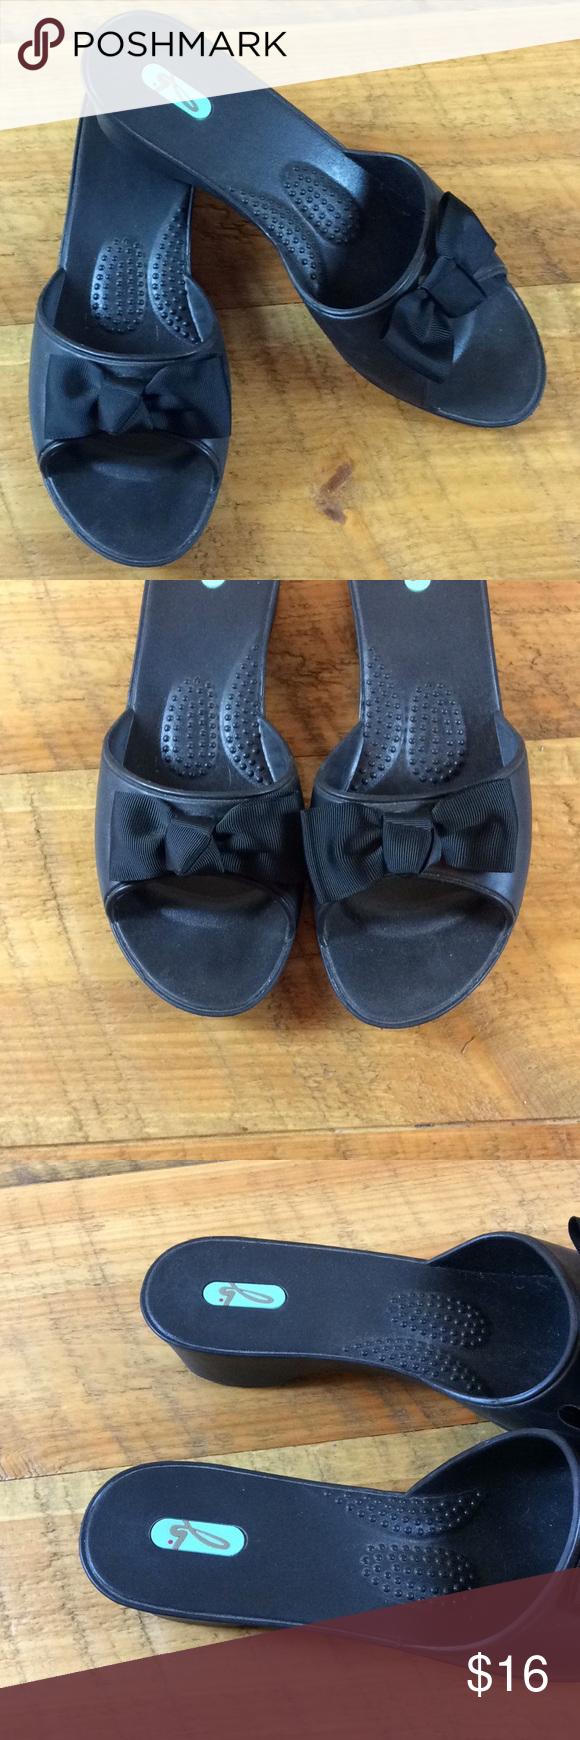 1b429b001dda9b Oka-B black sandals with ribbon detail Size L EUC Oka-B sandals Size L  (10-11) Black Ribbon bow detail Soft